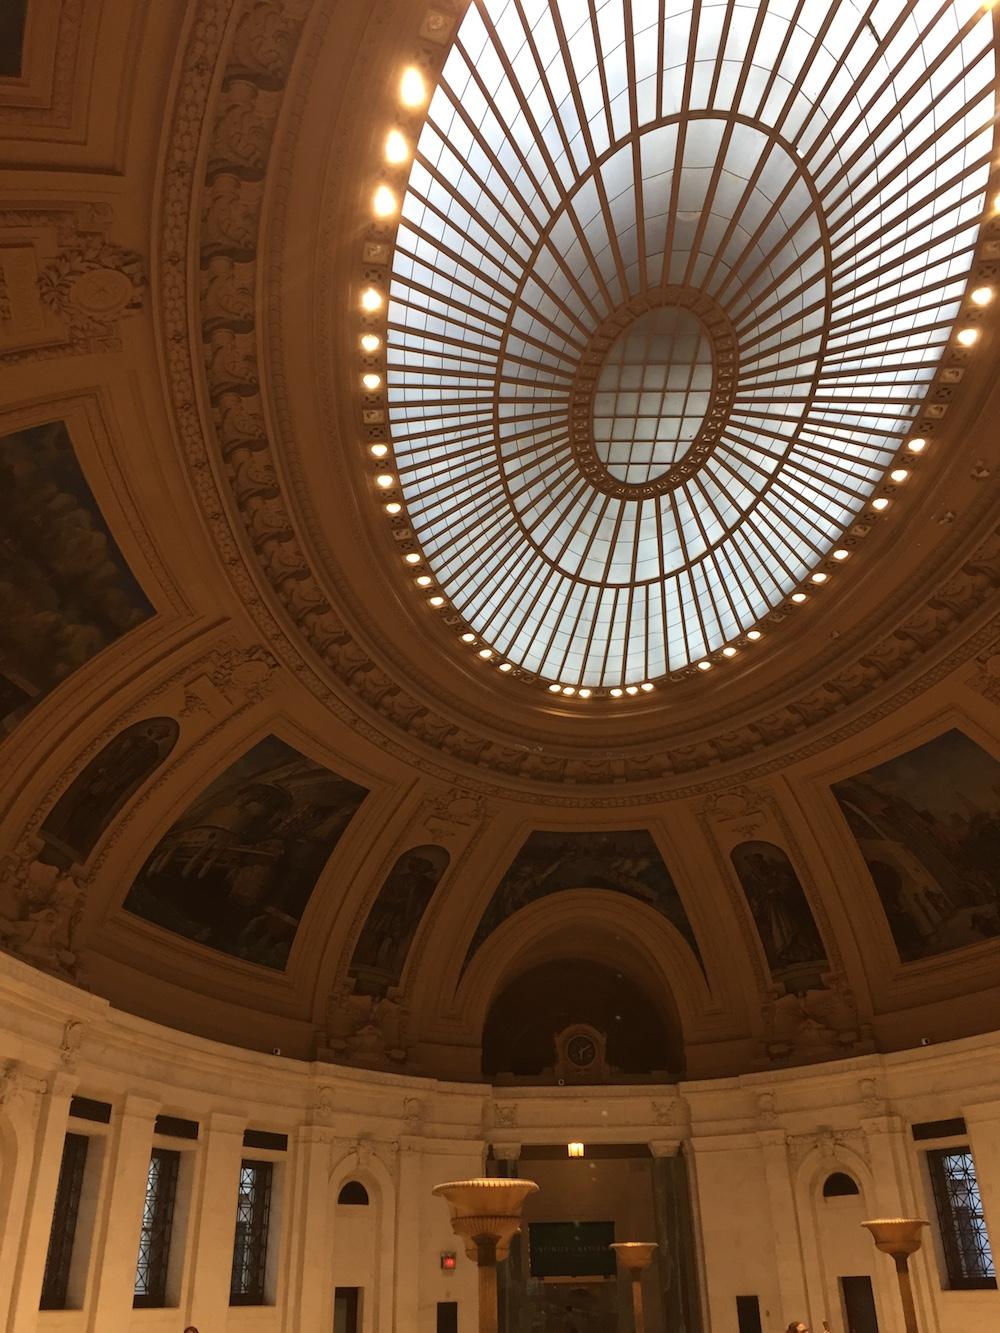 Skylight inside Alexander Hamilton U.S. Custom House | Photo credit; Rose Spaziani